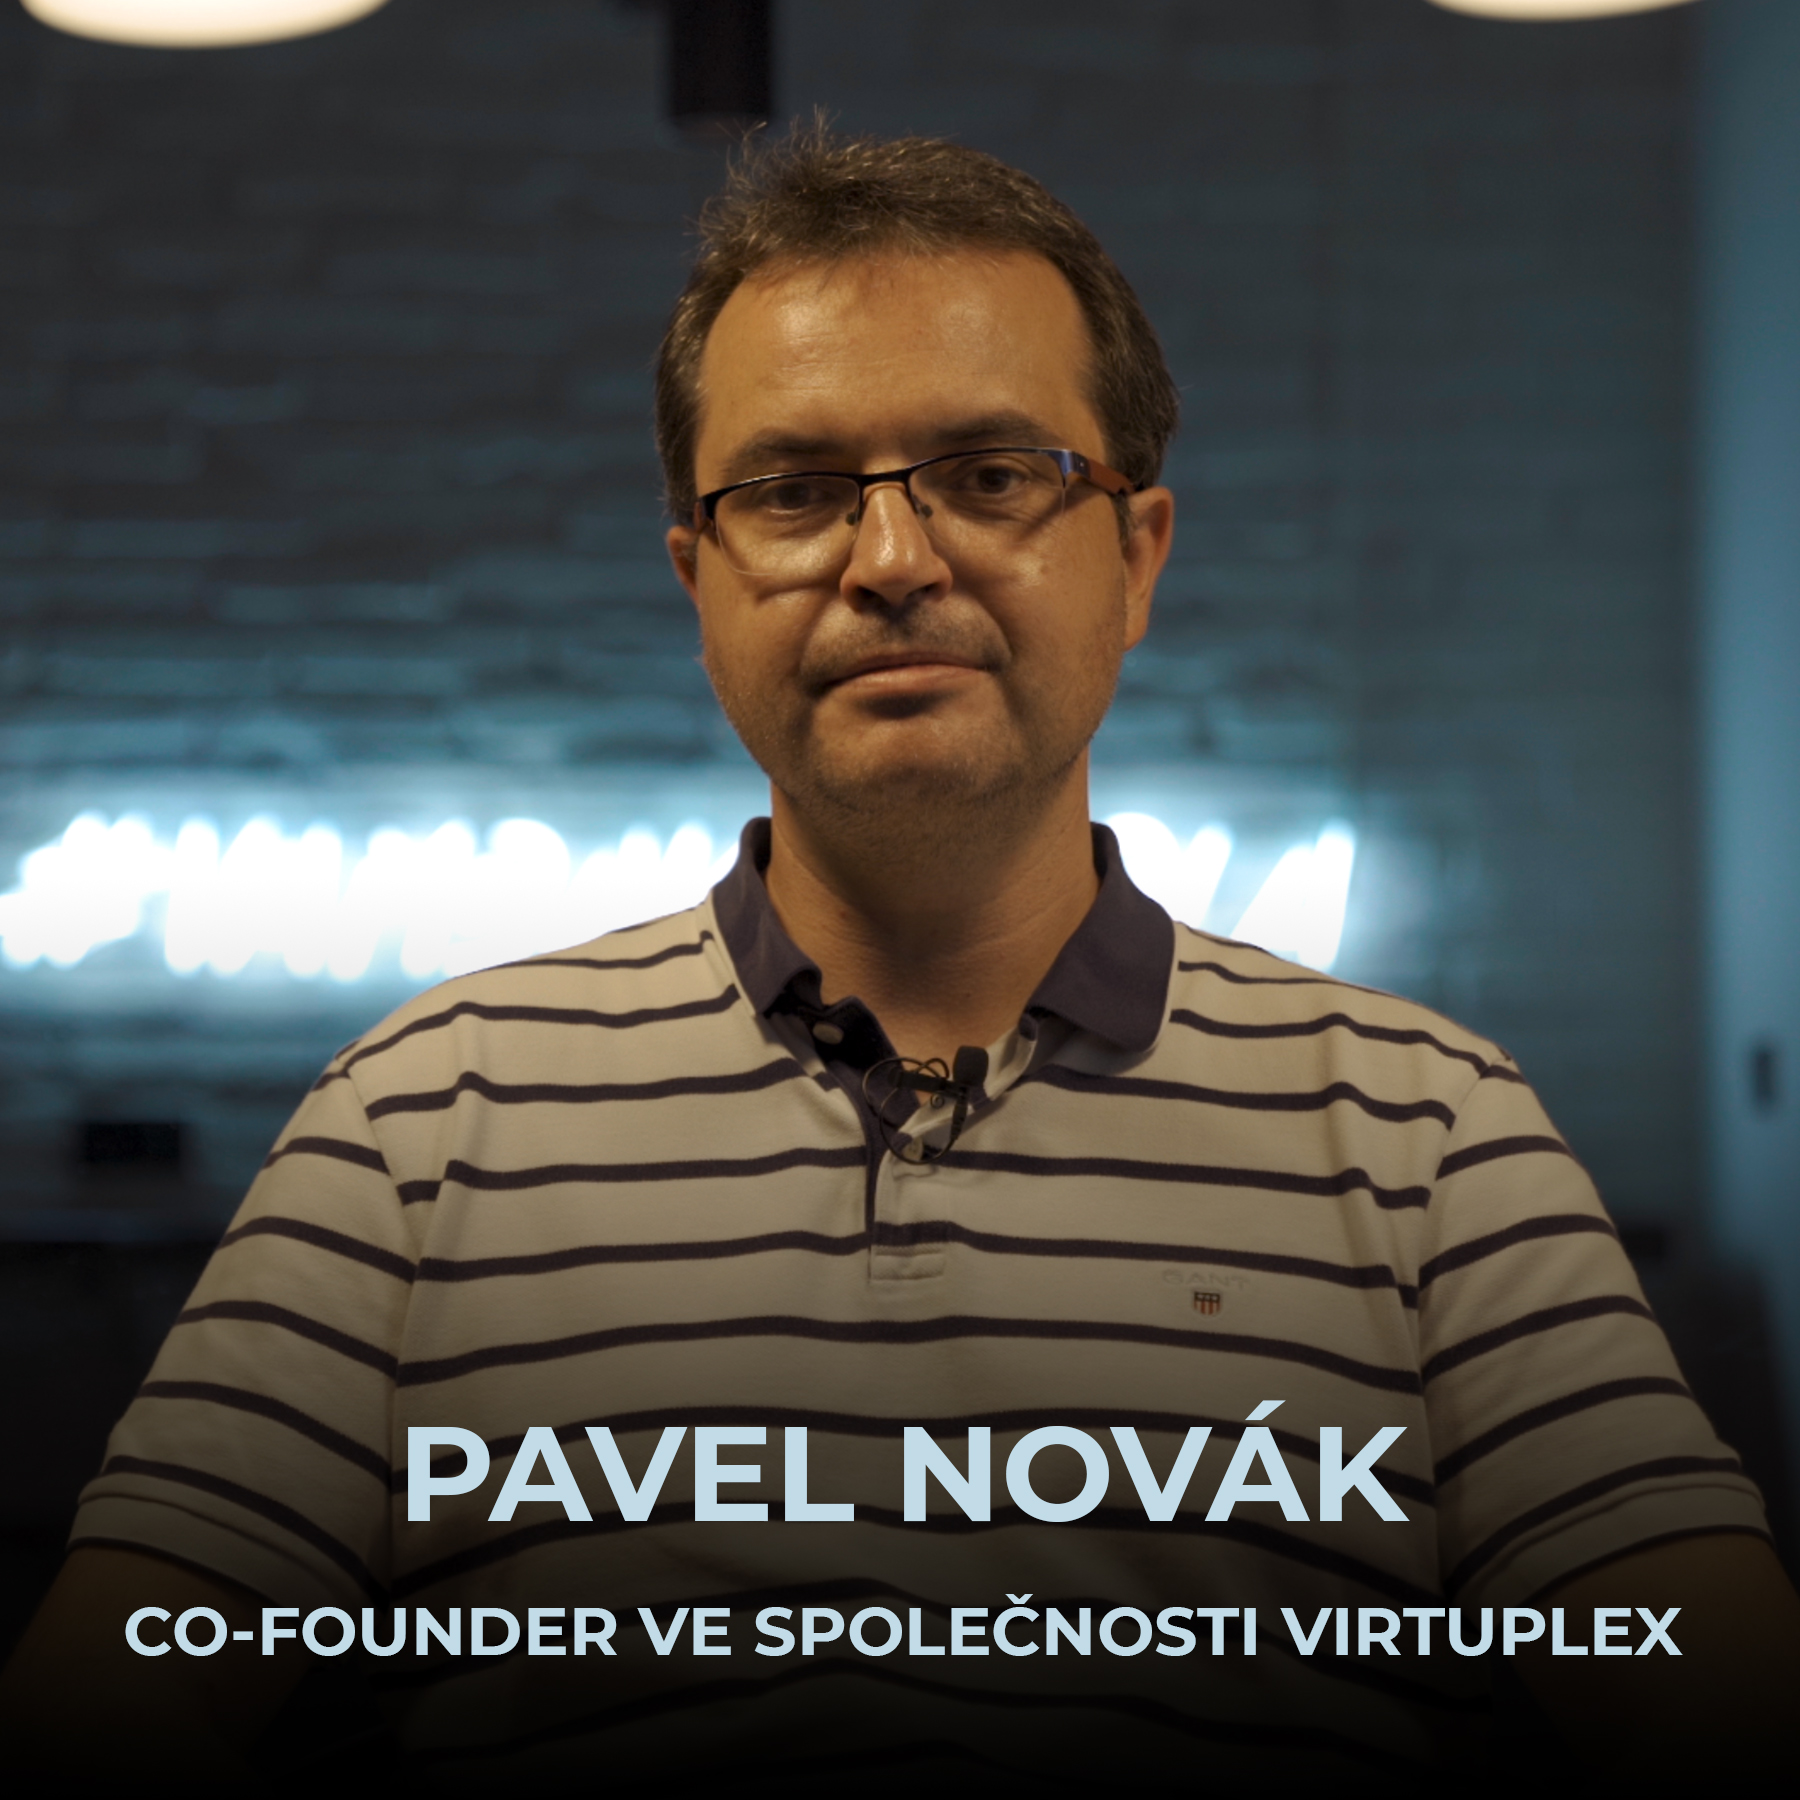 Pavel-Novak-IG-11